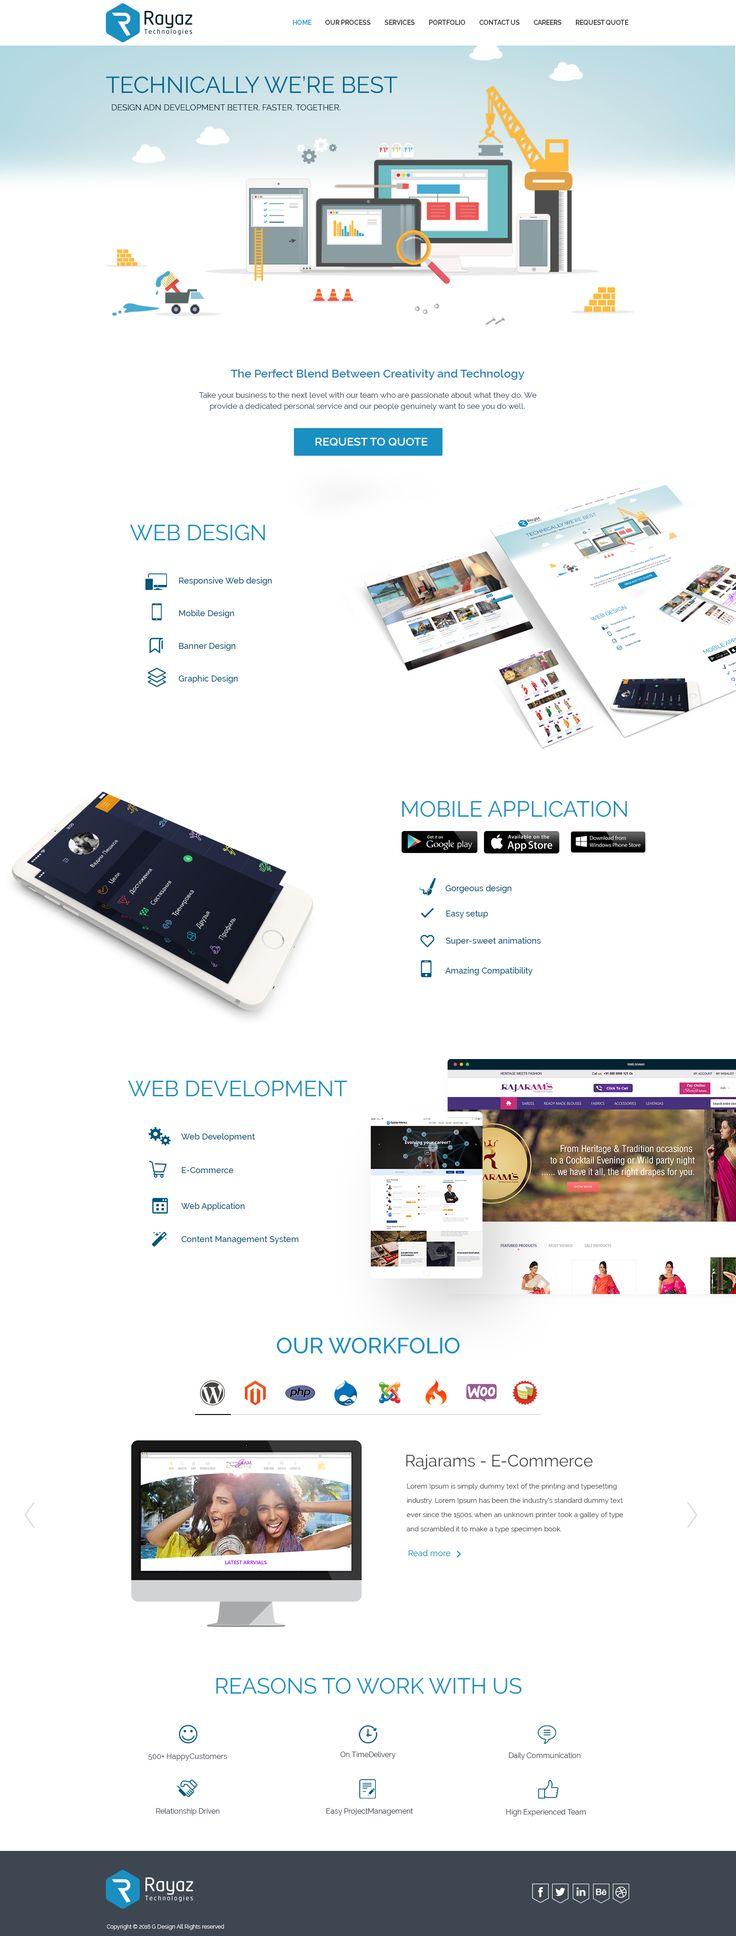 professional web solutions like web hosting, website designing, web application development.